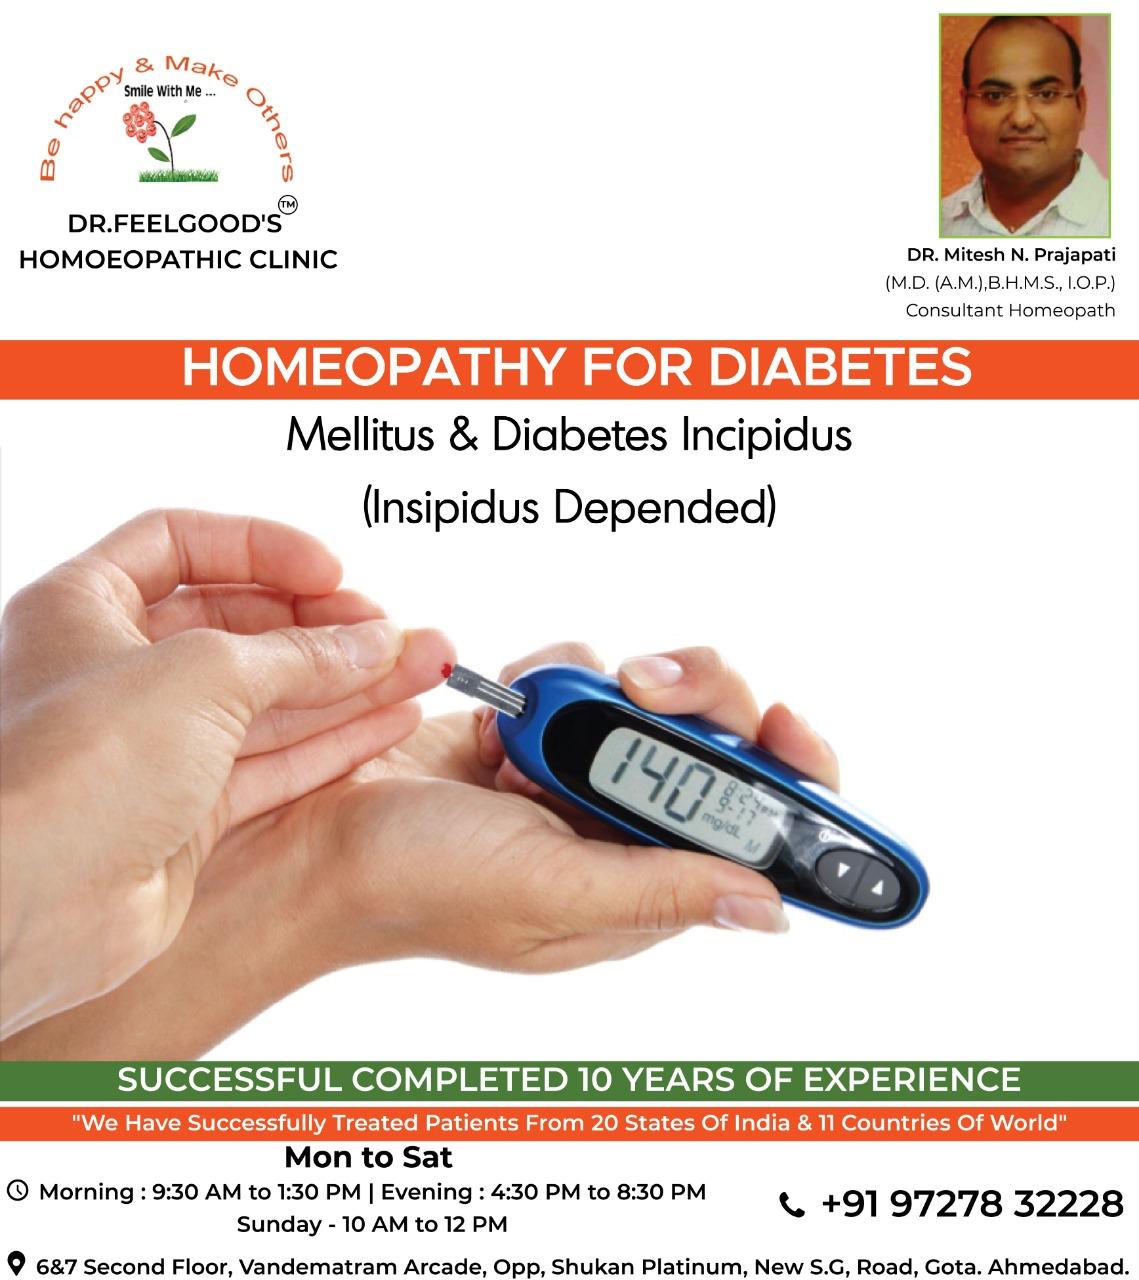 DR.MITESH PRAJAPATI- HOMEOPATHY FOR DIABETES (2)